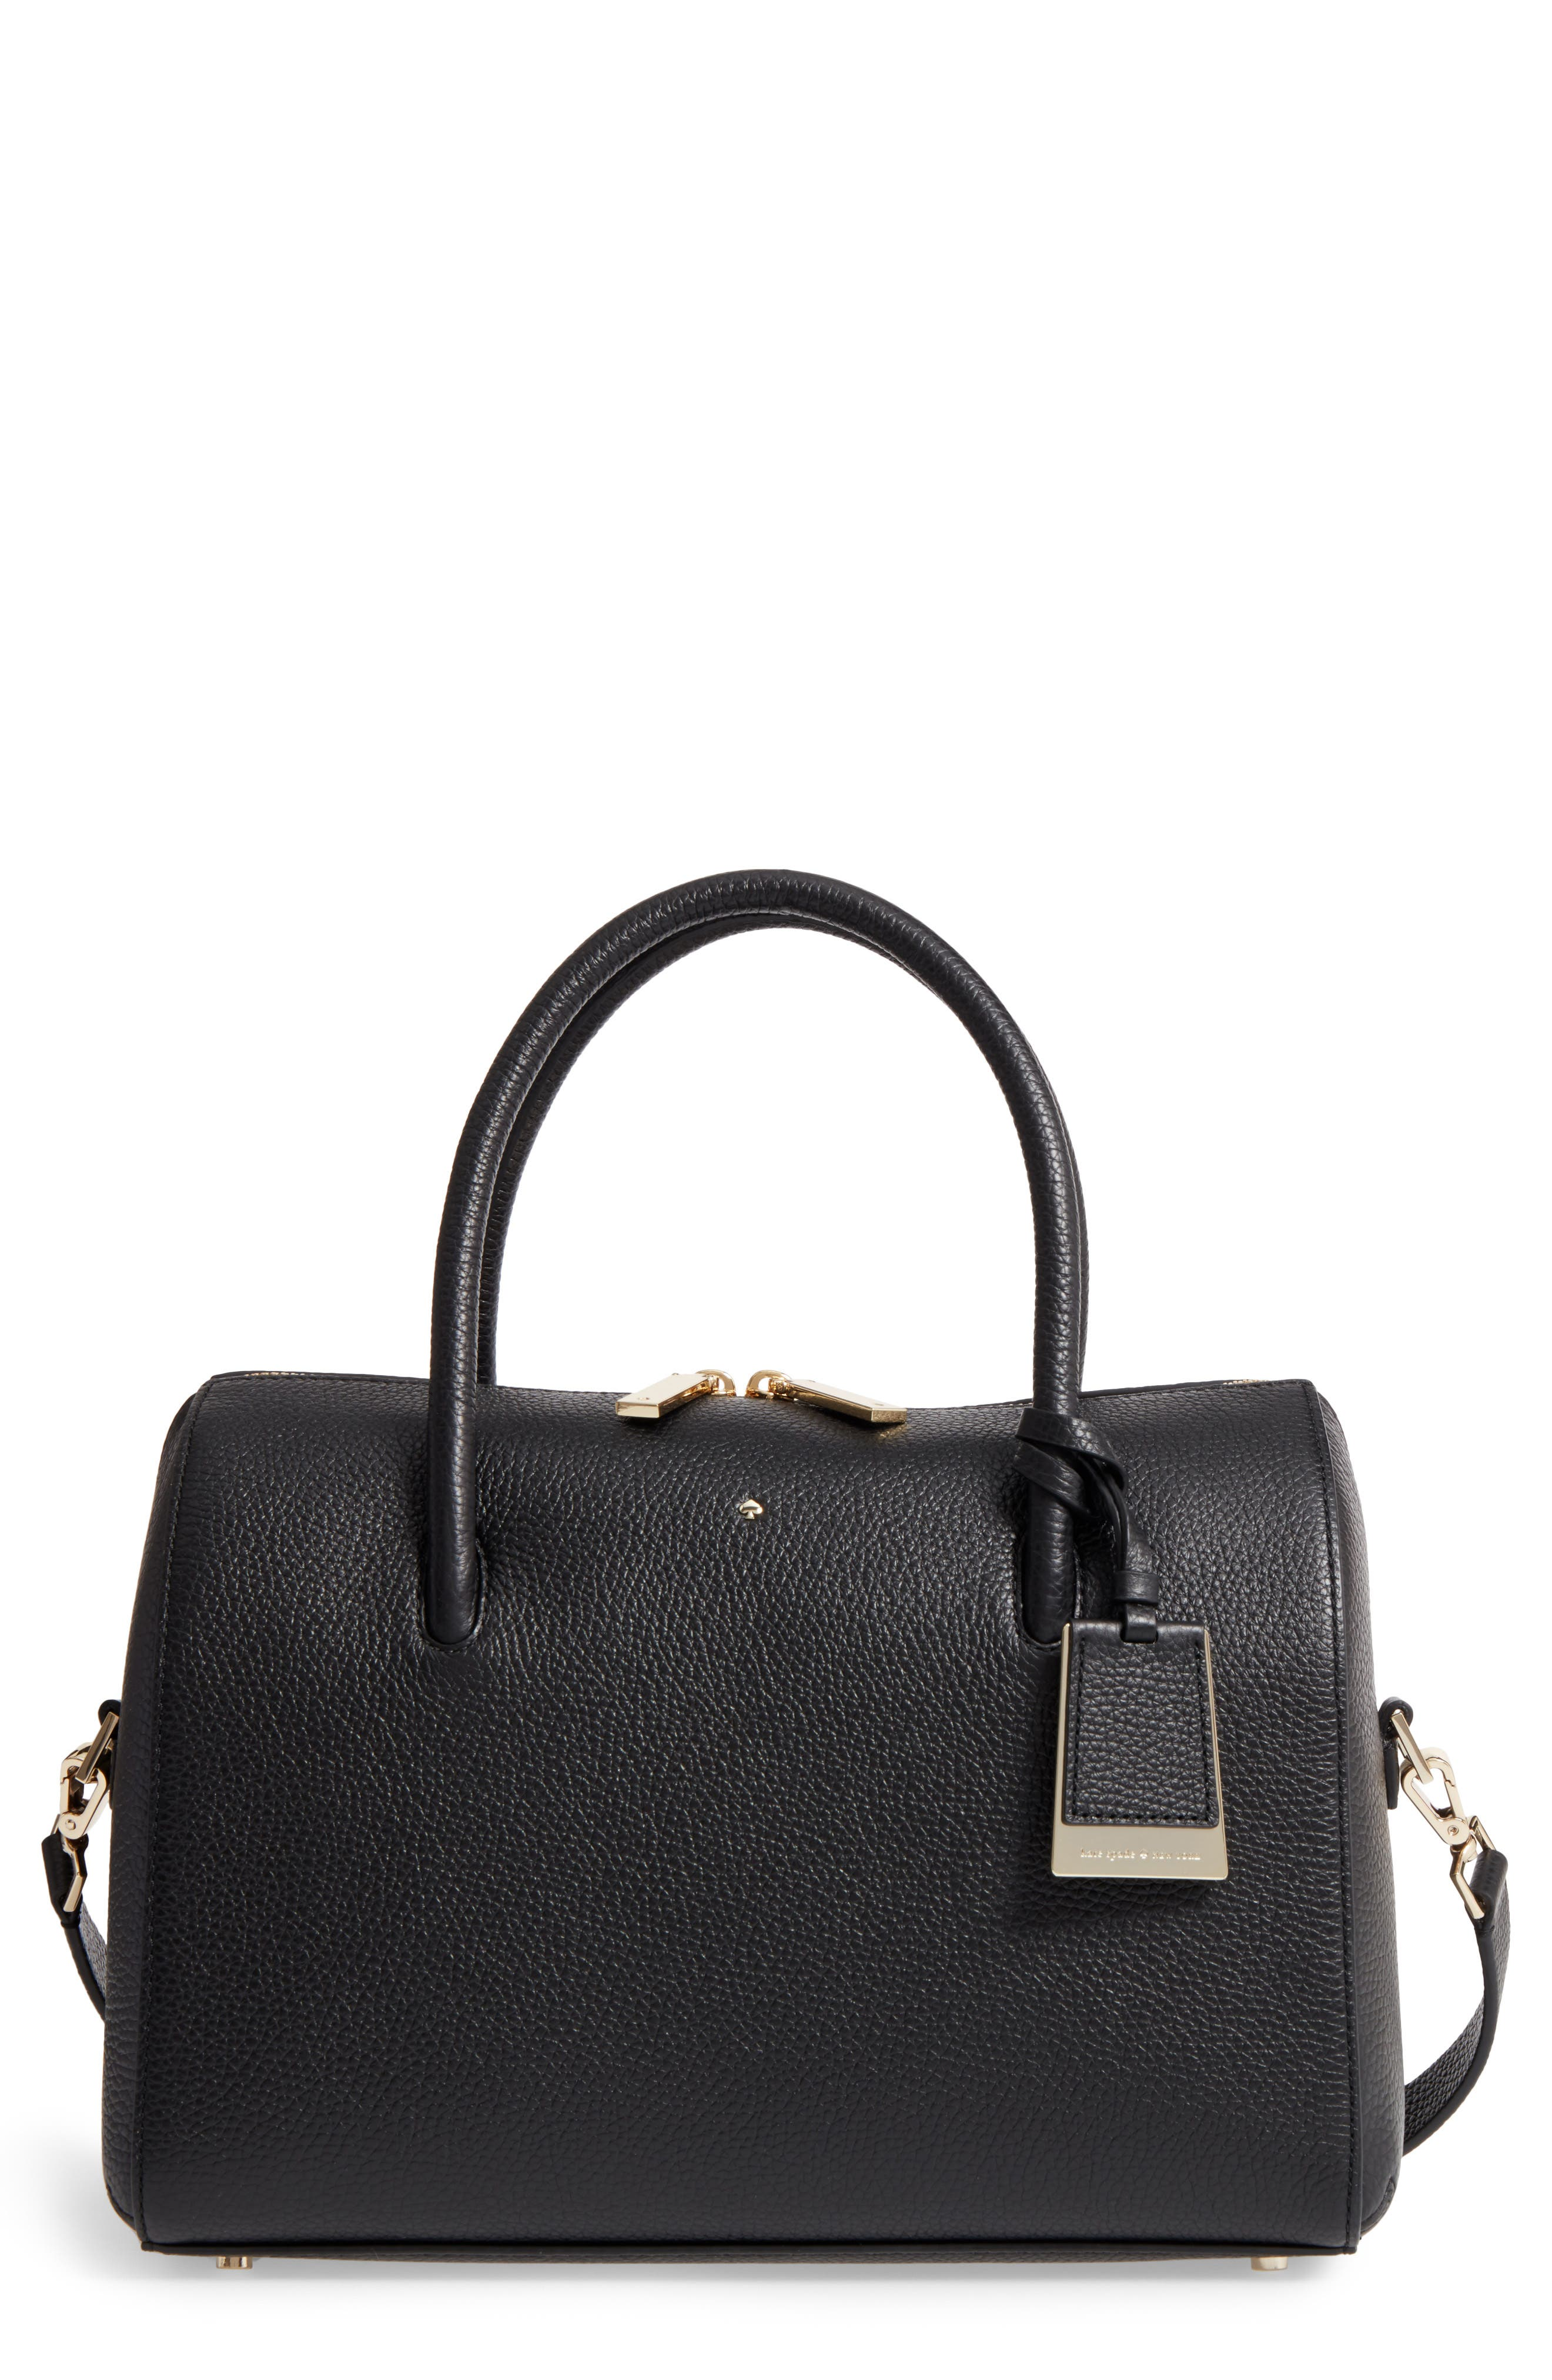 kate spade new york mega madison knollwood drive - lane leather satchel